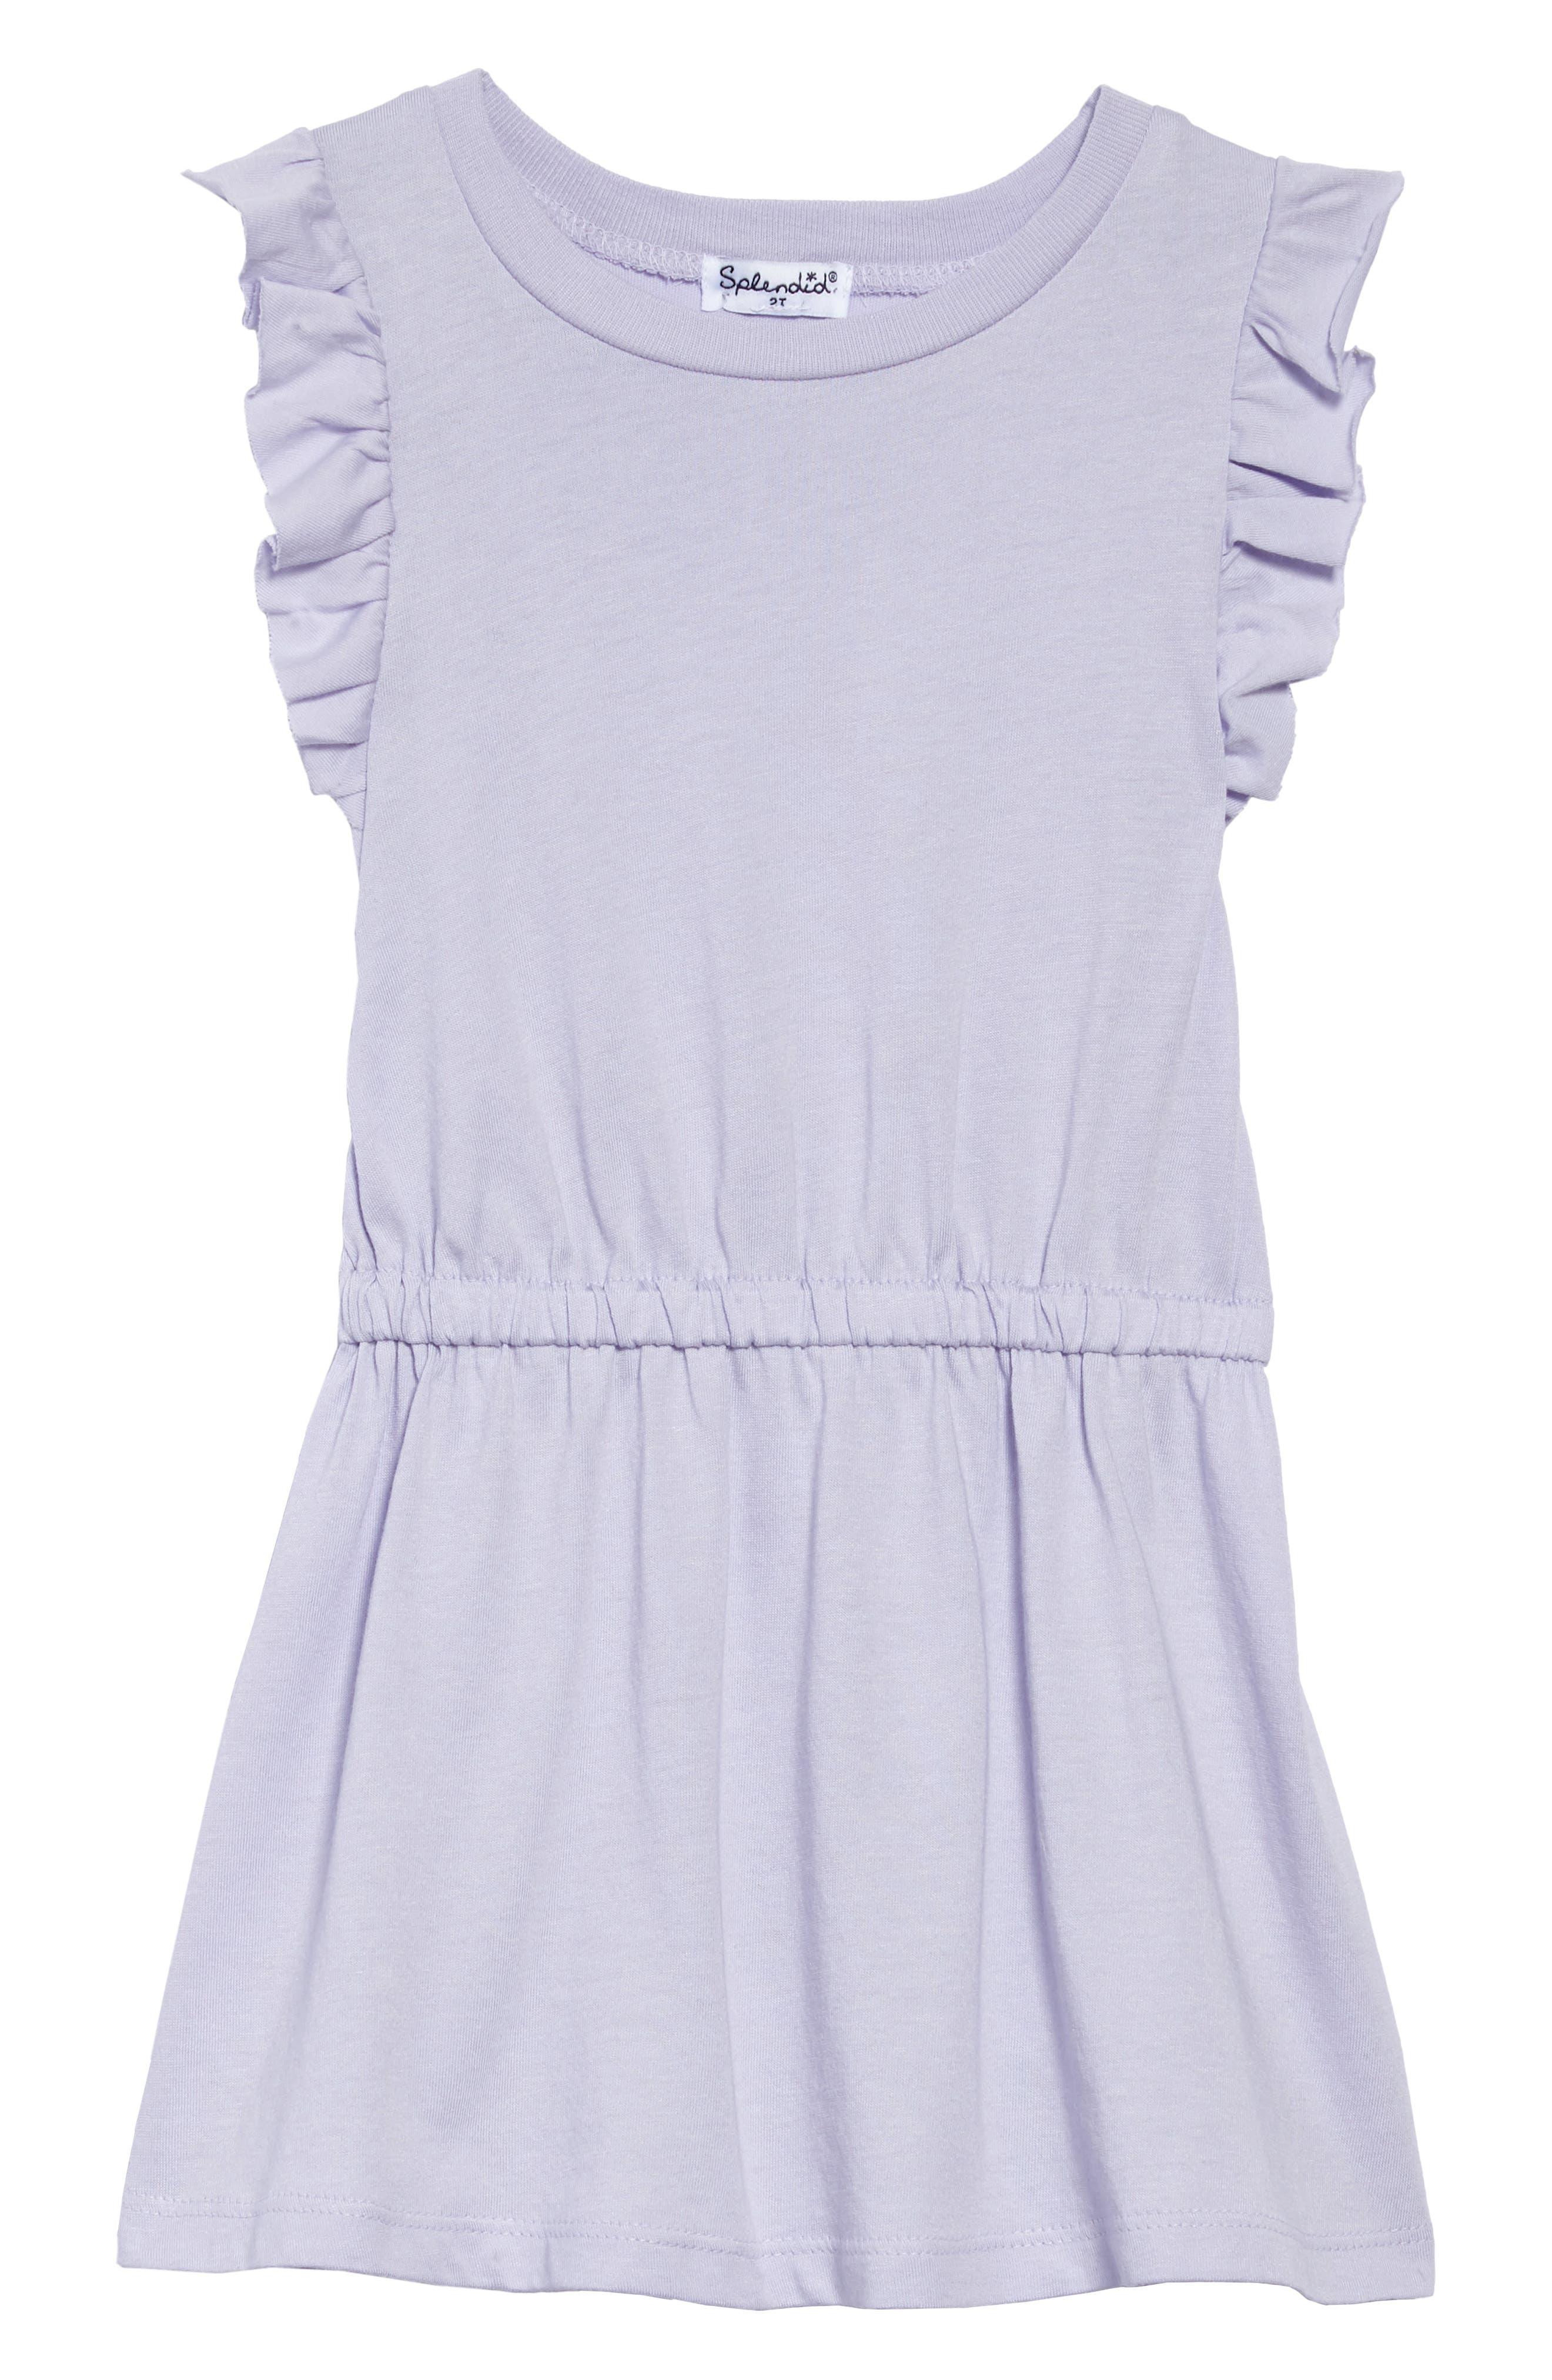 Ruffle Dress,                             Main thumbnail 1, color,                             530